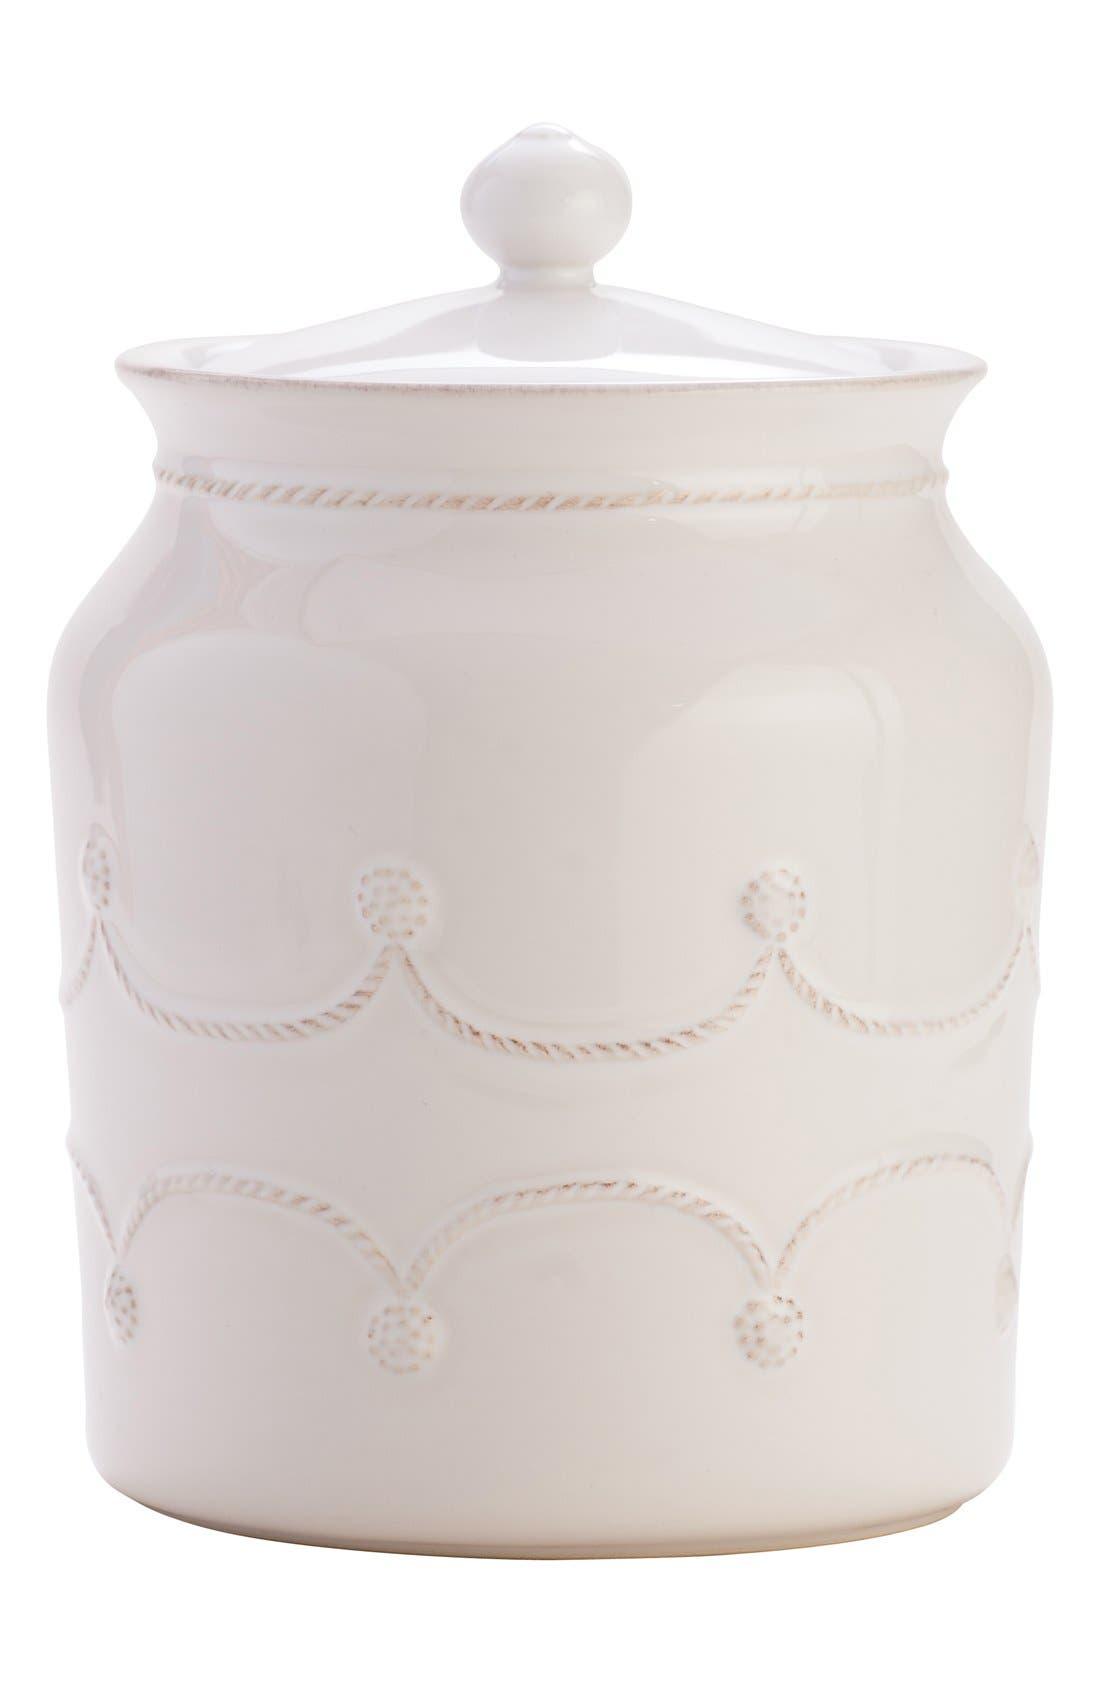 Main Image - Juliska'Berry and Thread' Ceramic Cookie Jar